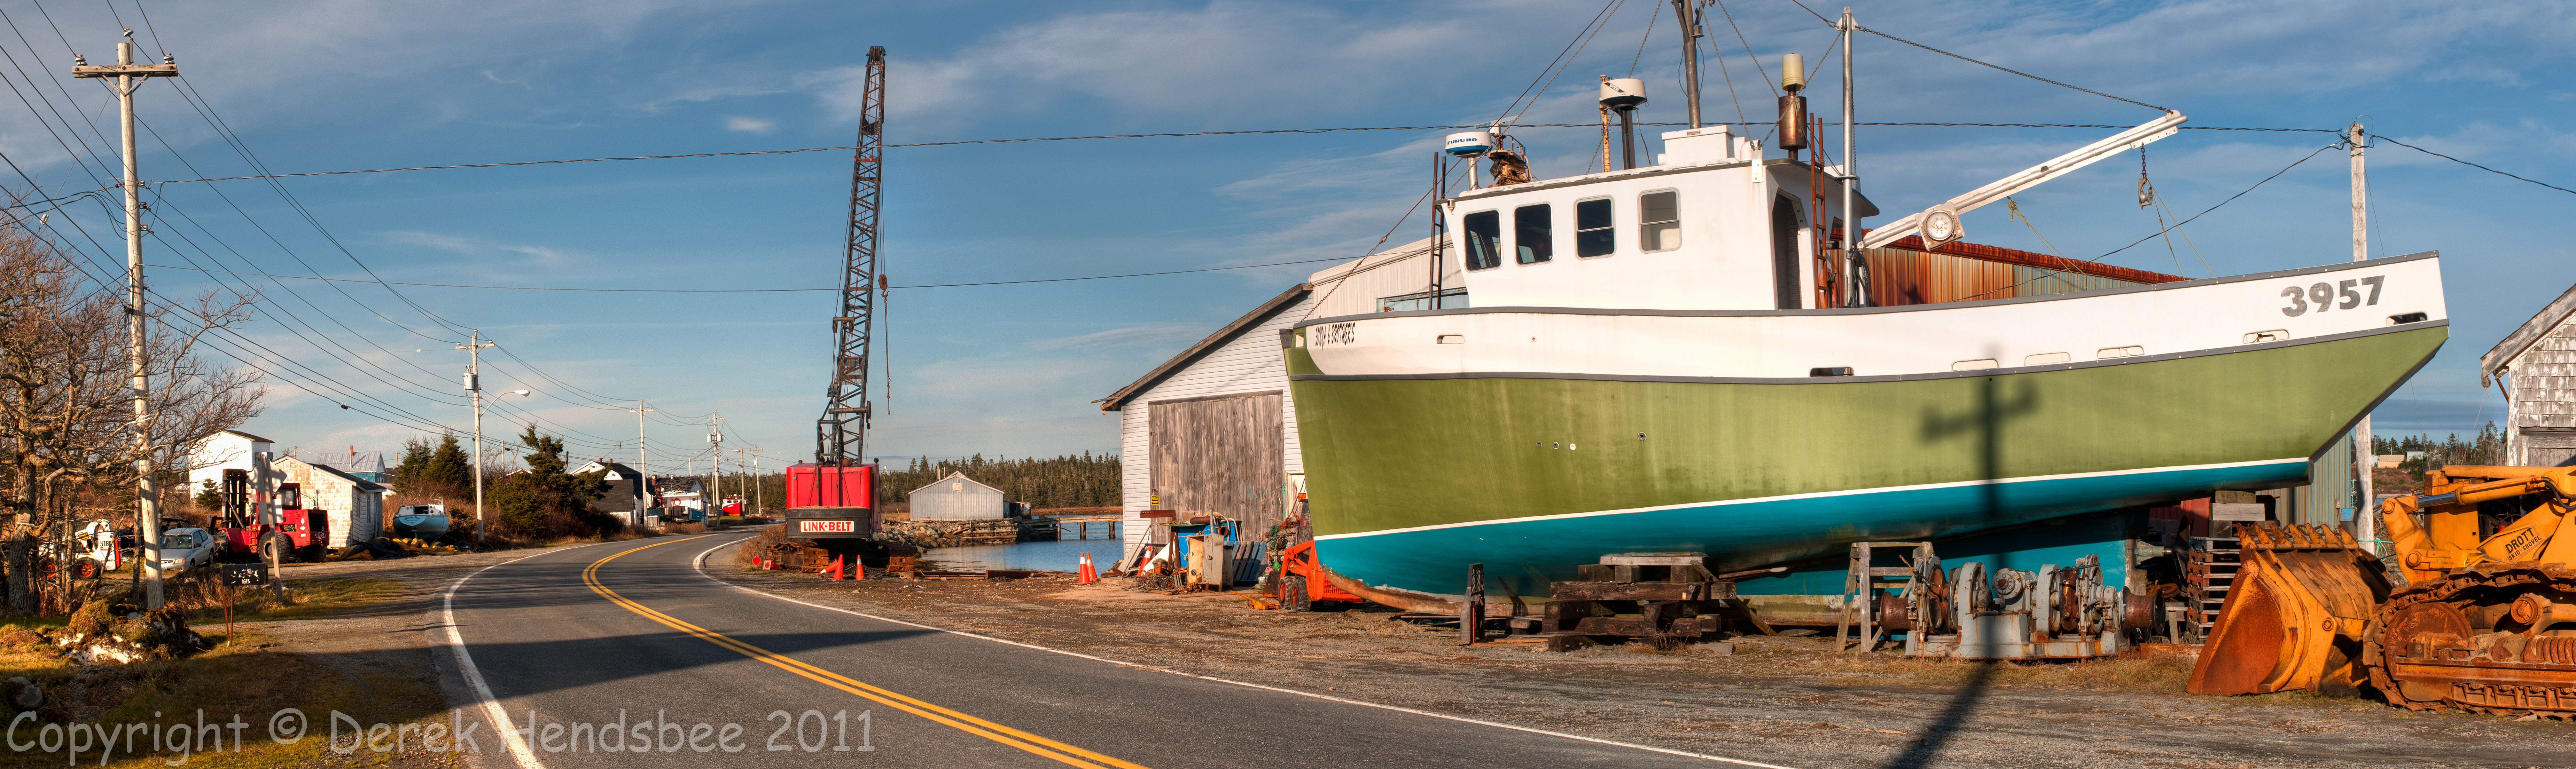 Old fishing boat get out in guysborough county for Nova scotia fishing